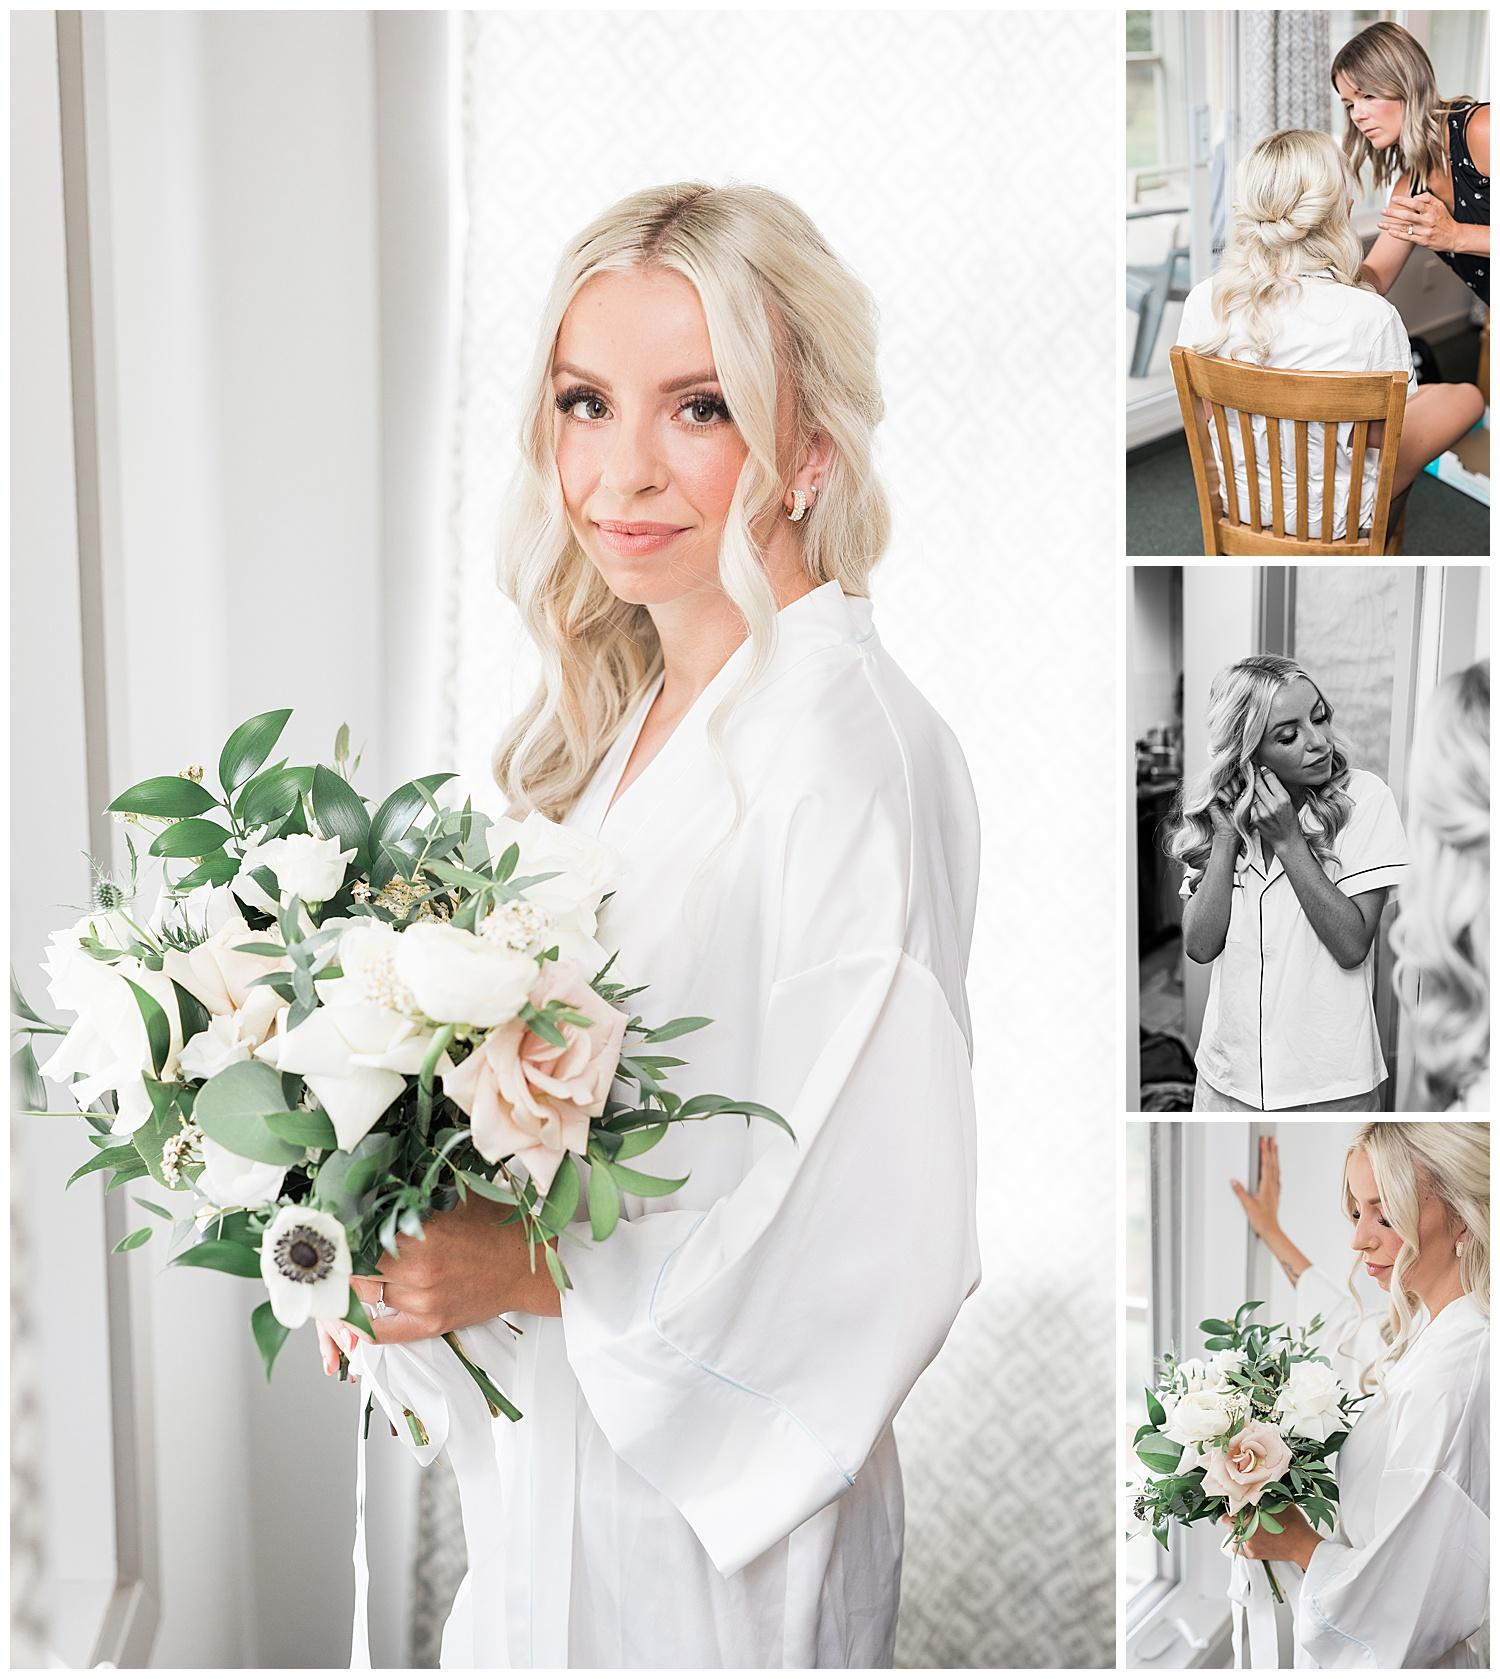 silvertip-summer-wedding-canmore-photographer-_0002.jpg